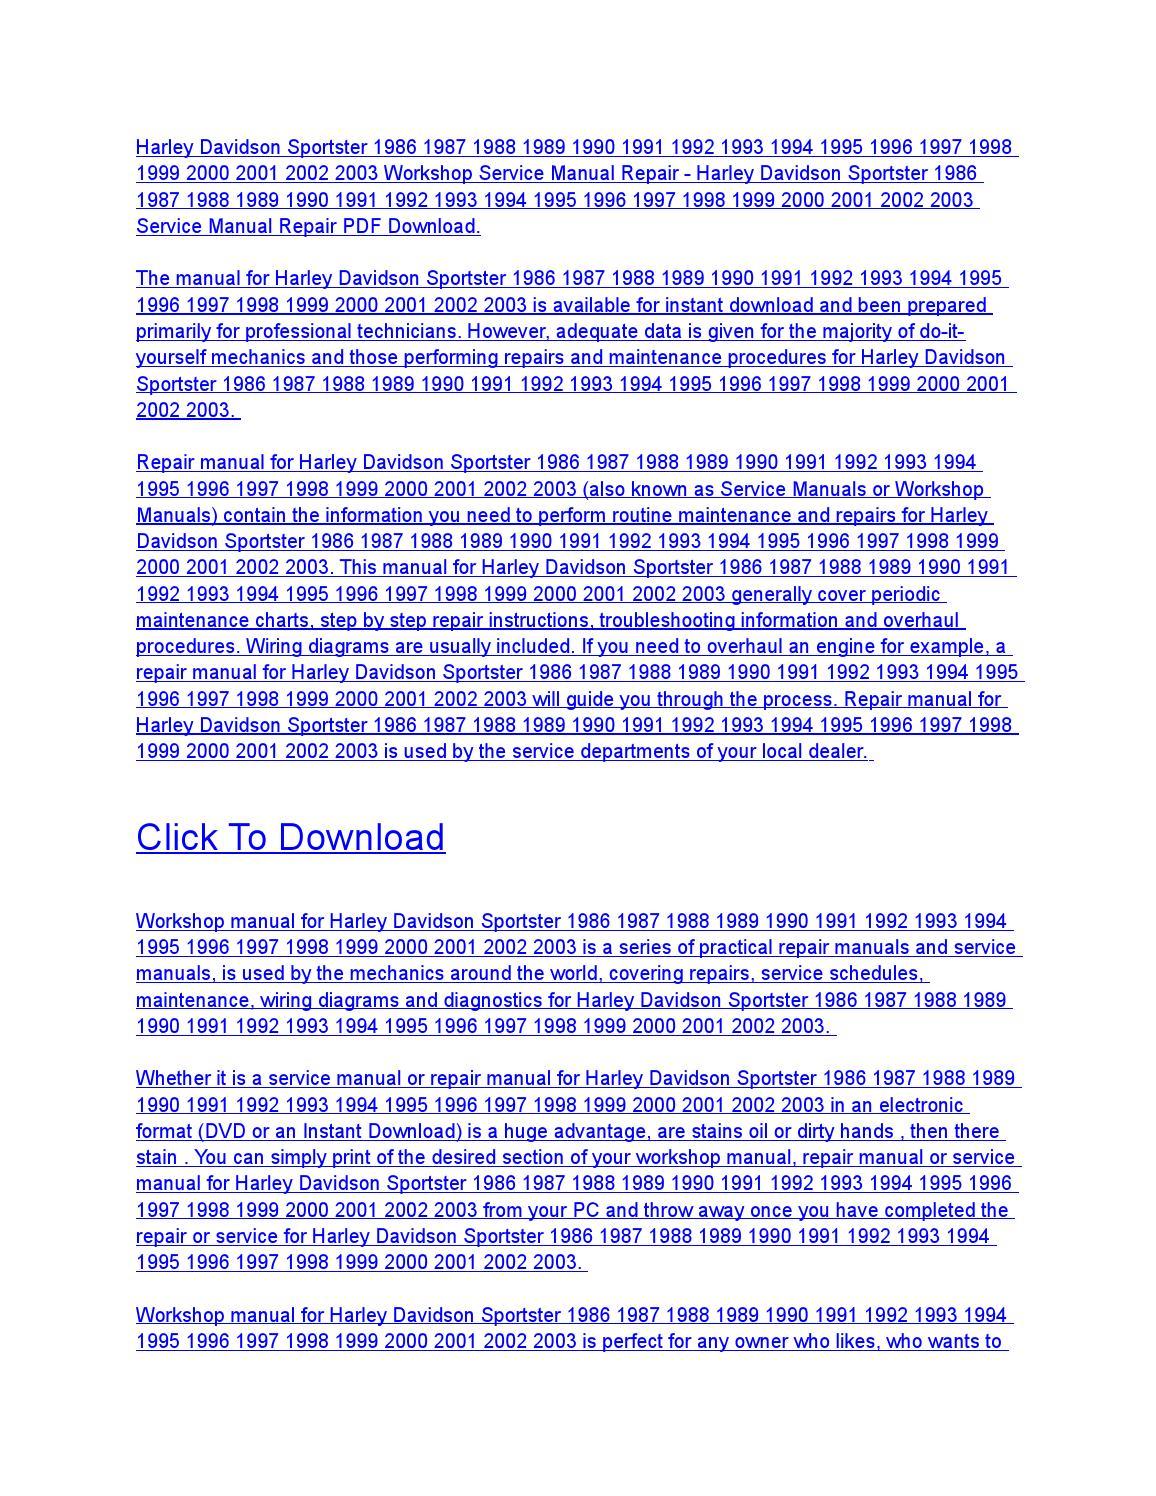 Harley davidson sportster 1986 1987 1988 1989 1990 1991 1992 ... on harley starter wiring diagram, 2001 sportster ignition system diagram, triumph speed triple wiring diagram, harley-davidson street glide wiring diagram, ducati 998 wiring diagram, harley-davidson tail light wiring diagram, split unit air conditioner wiring diagram, harley-davidson motorcycle parts diagram, chevrolet ssr wiring diagram, harley-davidson ultra classic wiring diagram, simple harley wiring diagram, harley-davidson golf cart wiring diagram, 1200 custom wiring diagram, harley-davidson gas tank diagram, honda cbr 600 parts diagram, harley-davidson street glide parts diagram, harley sportster oil line diagram, 1999 ford explorer electrical wiring diagram, harley dyna s ignition wiring diagram, harley wiring harness diagram,